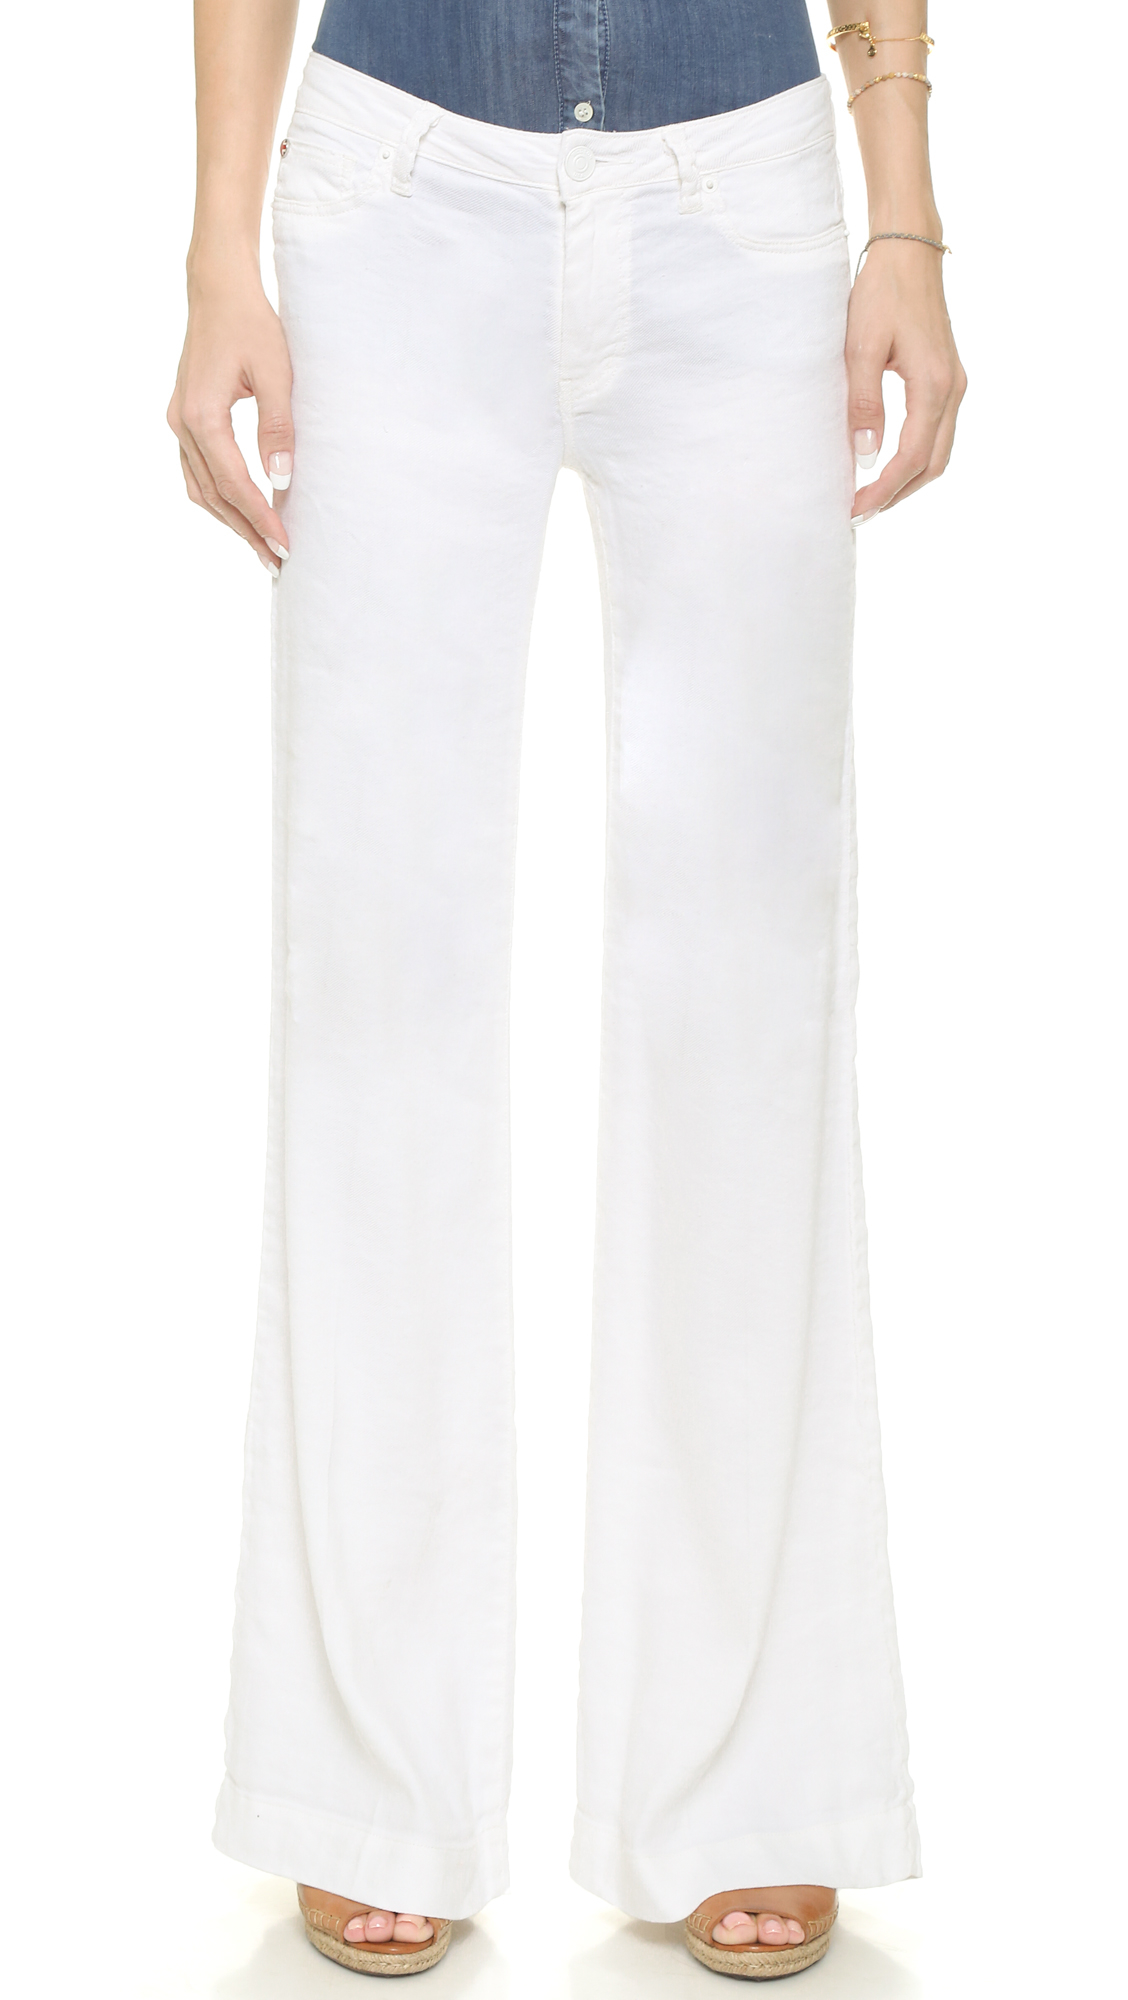 Hudson jeans Gwen Wide Leg Linen Pants - White in White | Lyst